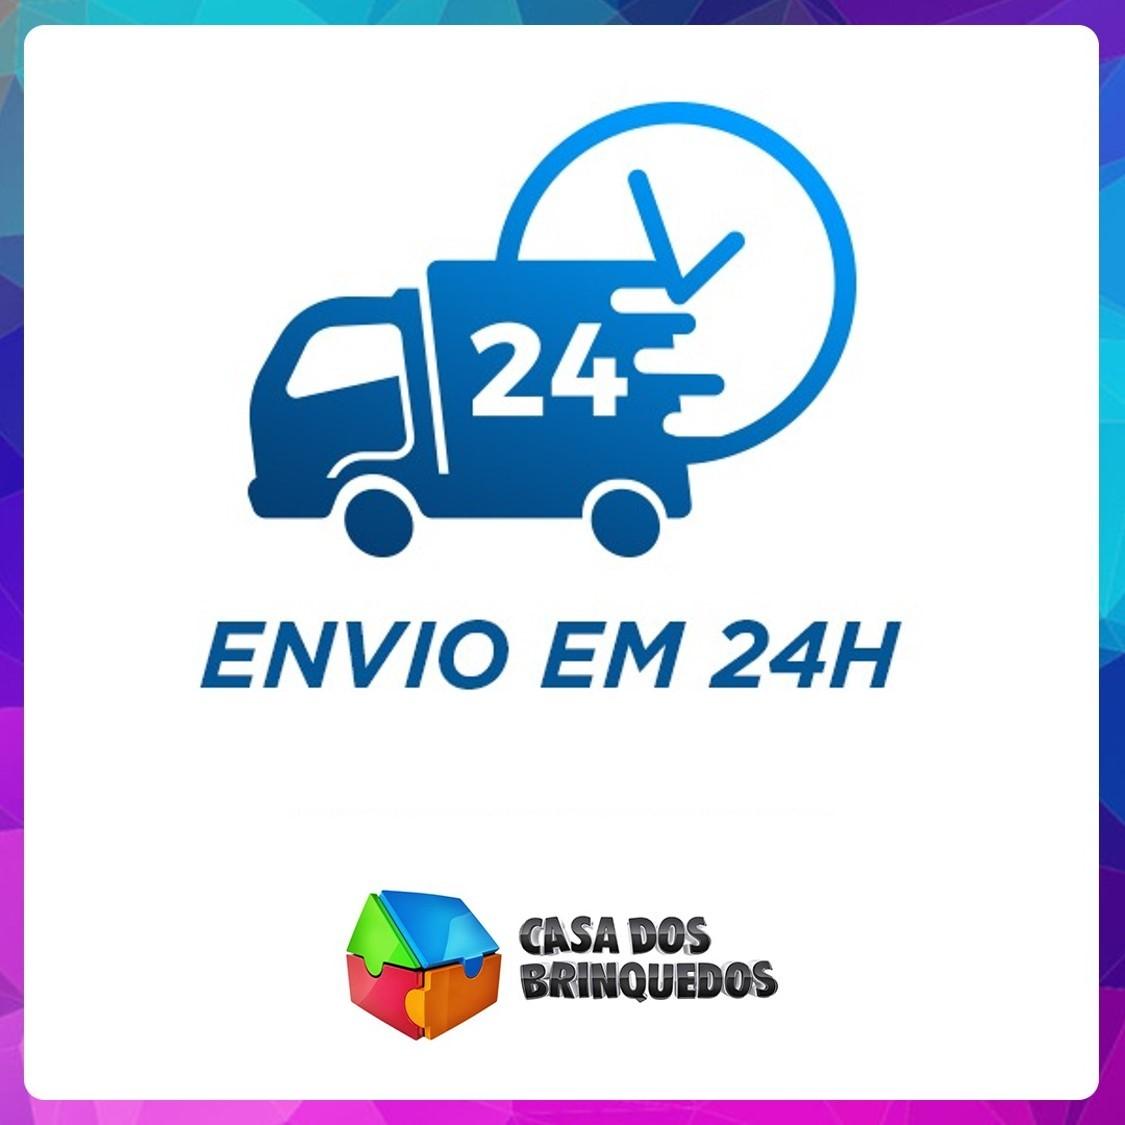 BONECA REBORN ANNY DOLL BABY MACACÃO E BABADOR 2442 COTIPLÁS